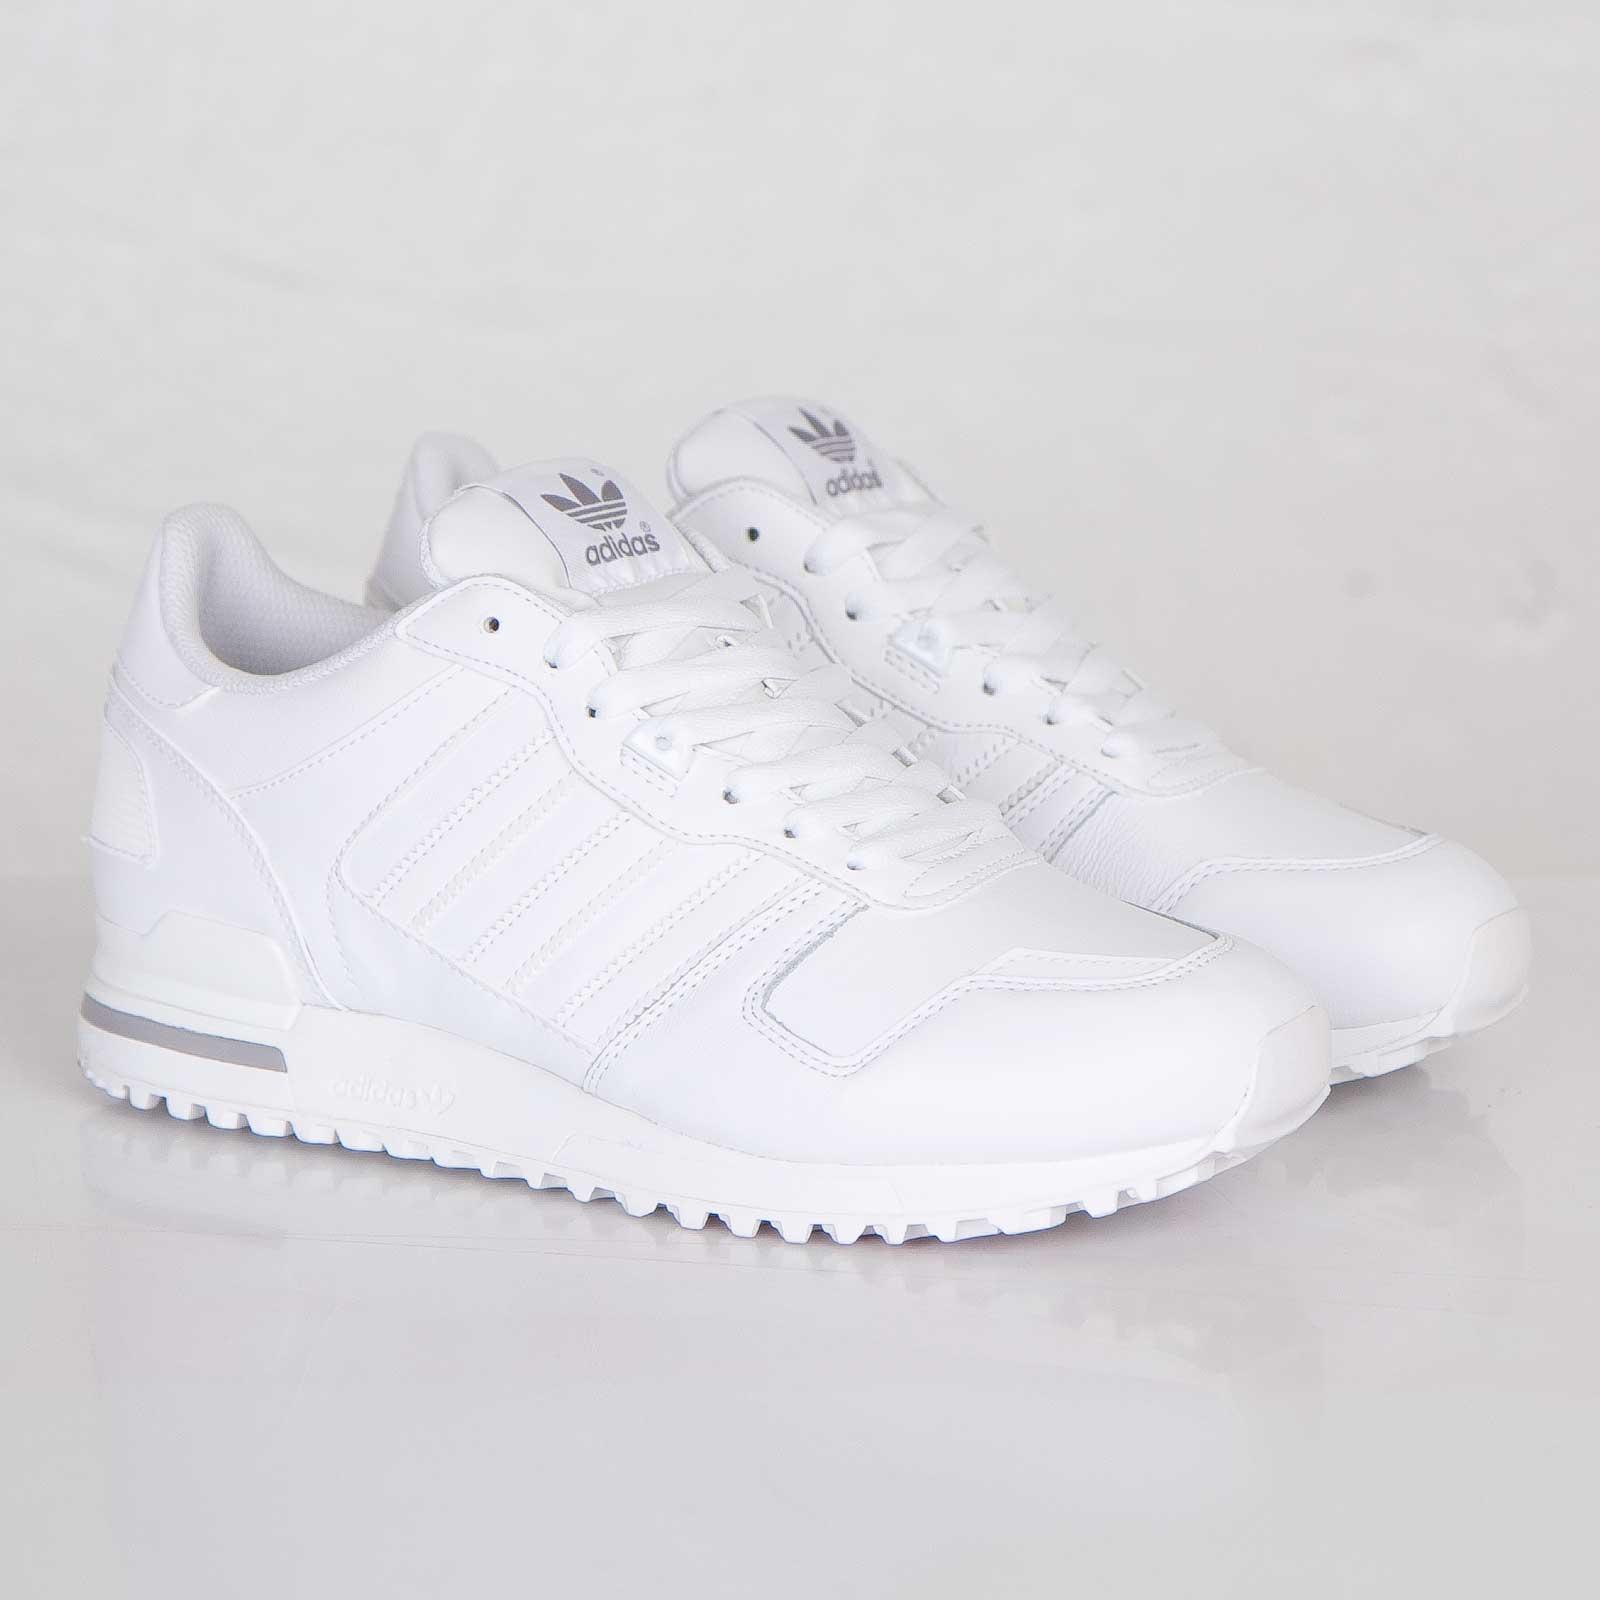 adidas ZX 700 - G62110 - Sneakersnstuff